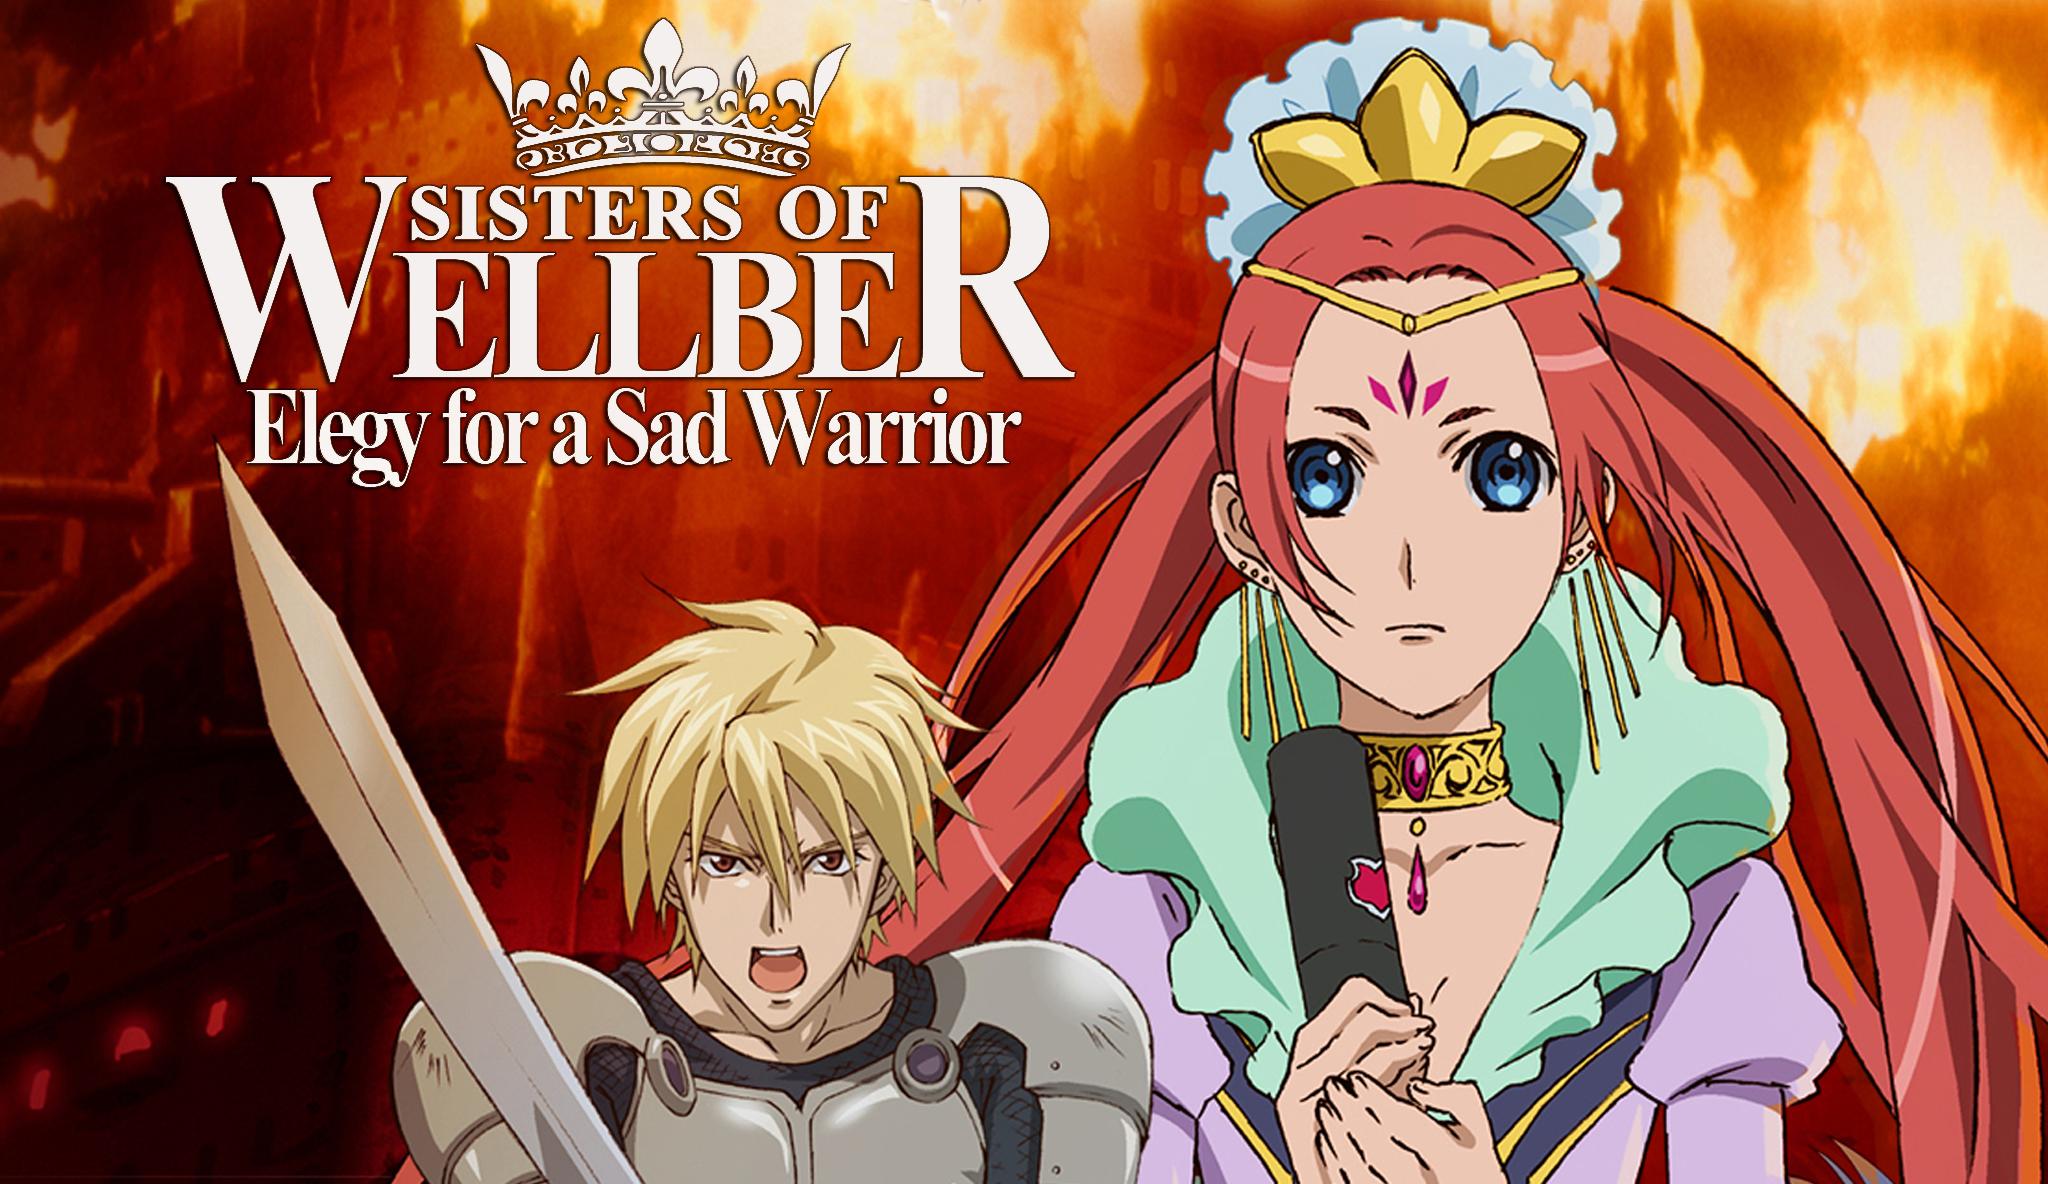 sisters-of-wellber-elegy-for-a-sad-warrior\header.jpg